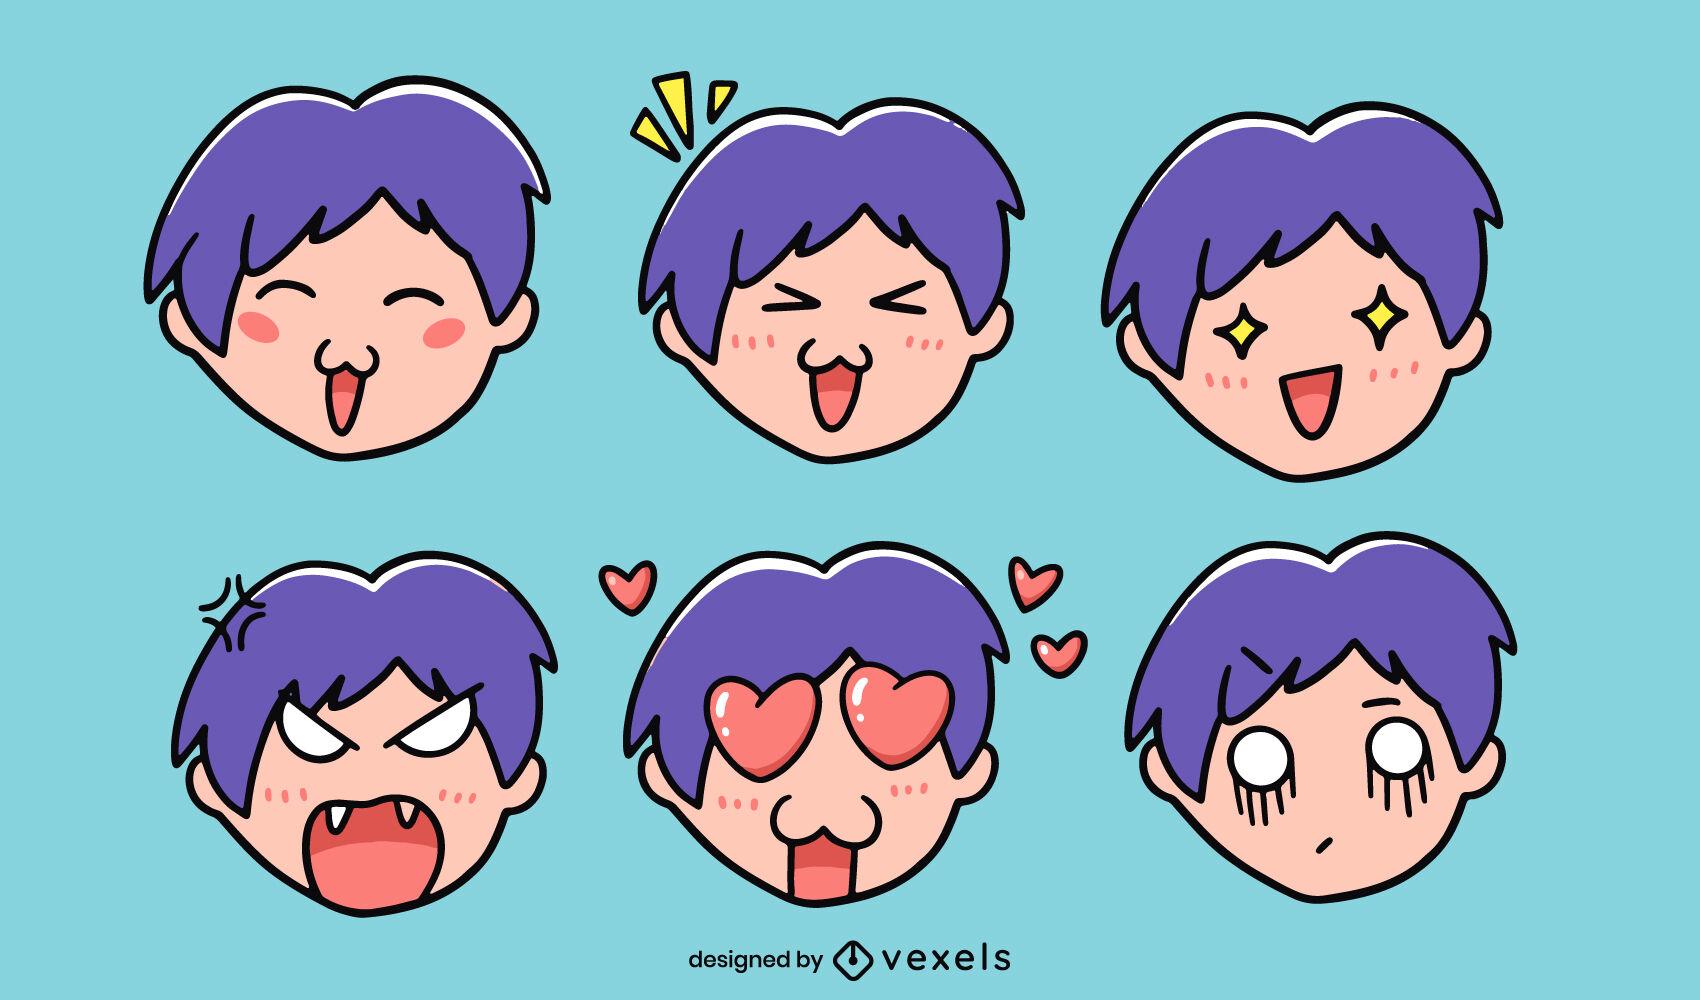 Funny anime boy emotions doodle set